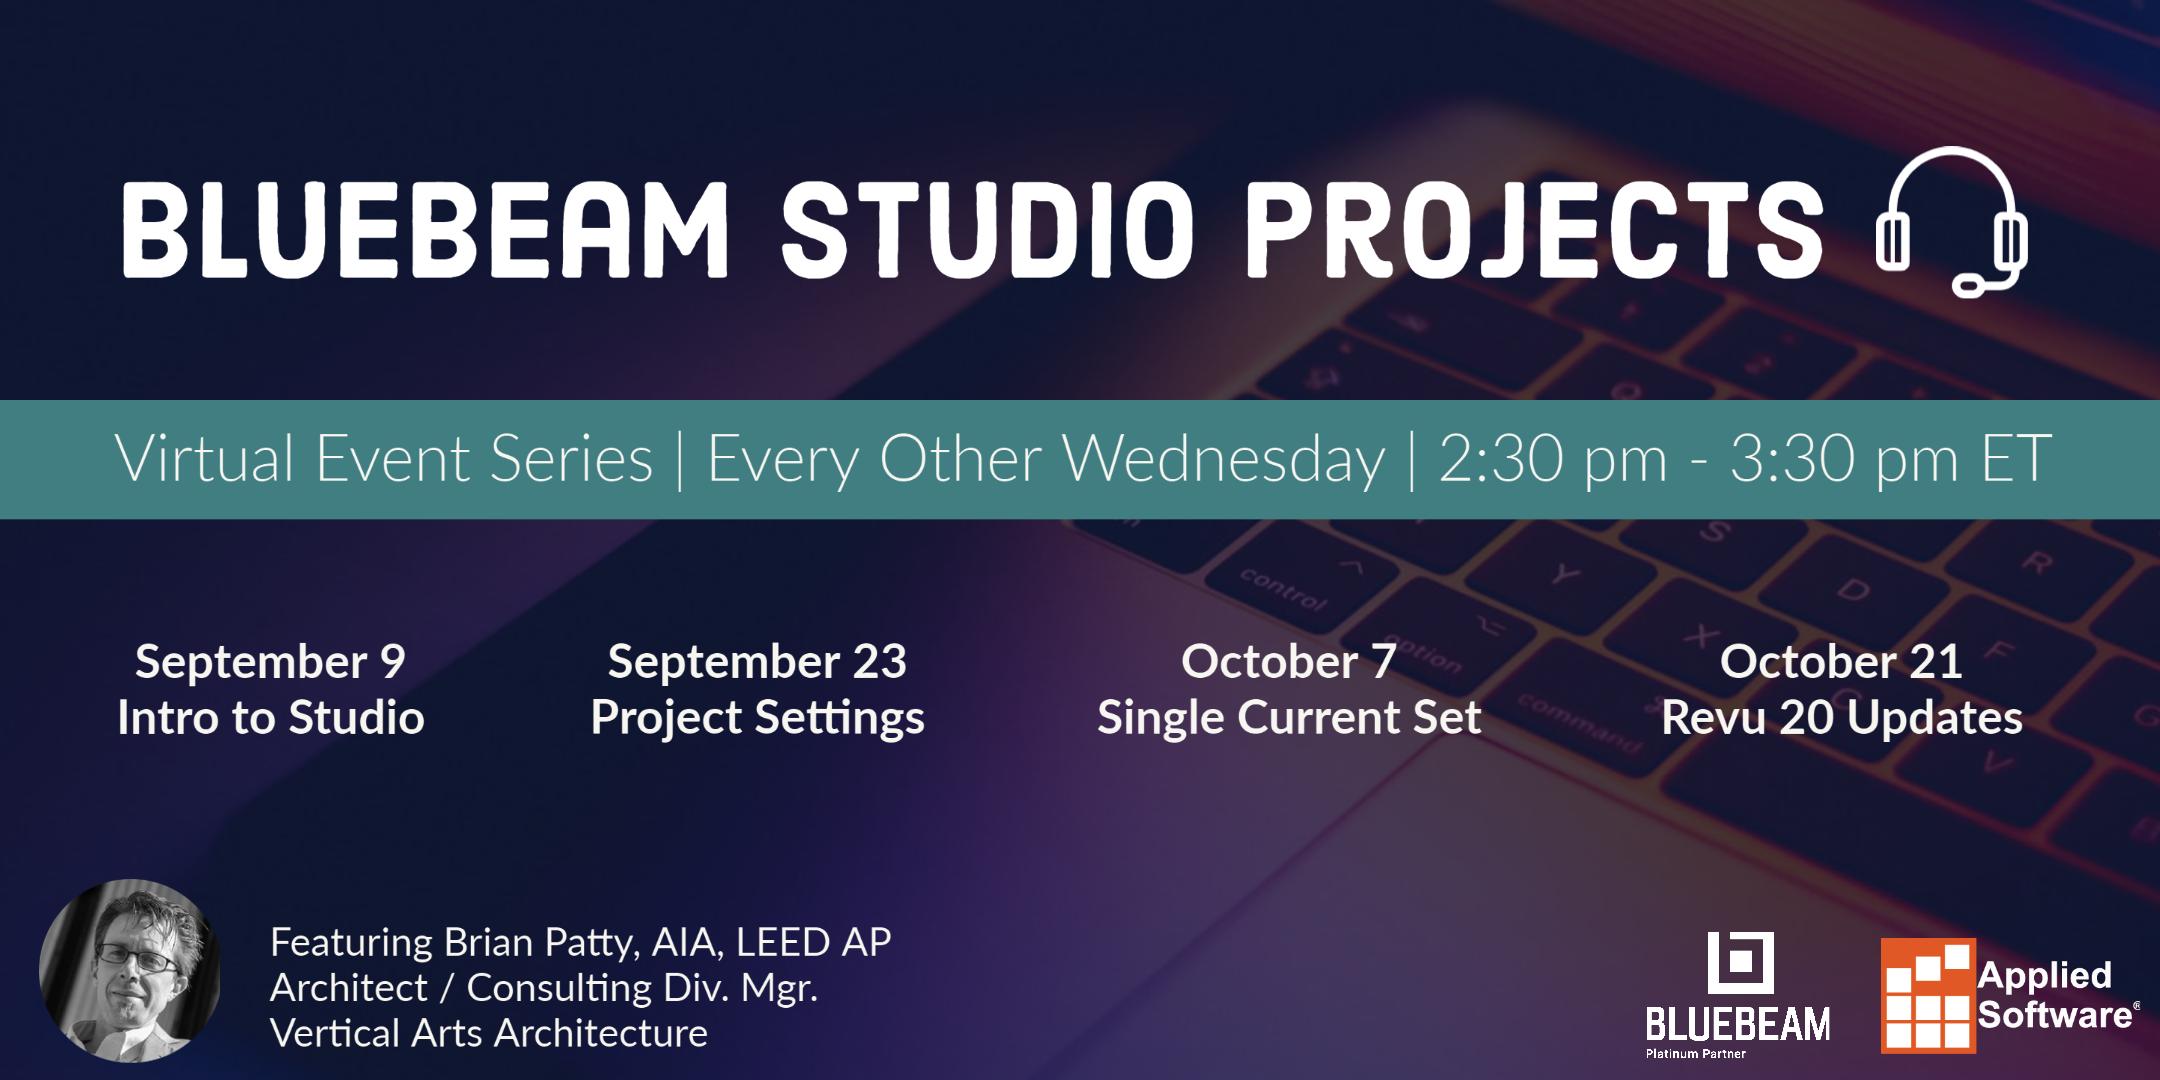 Bluebeam Studio Projects (1)